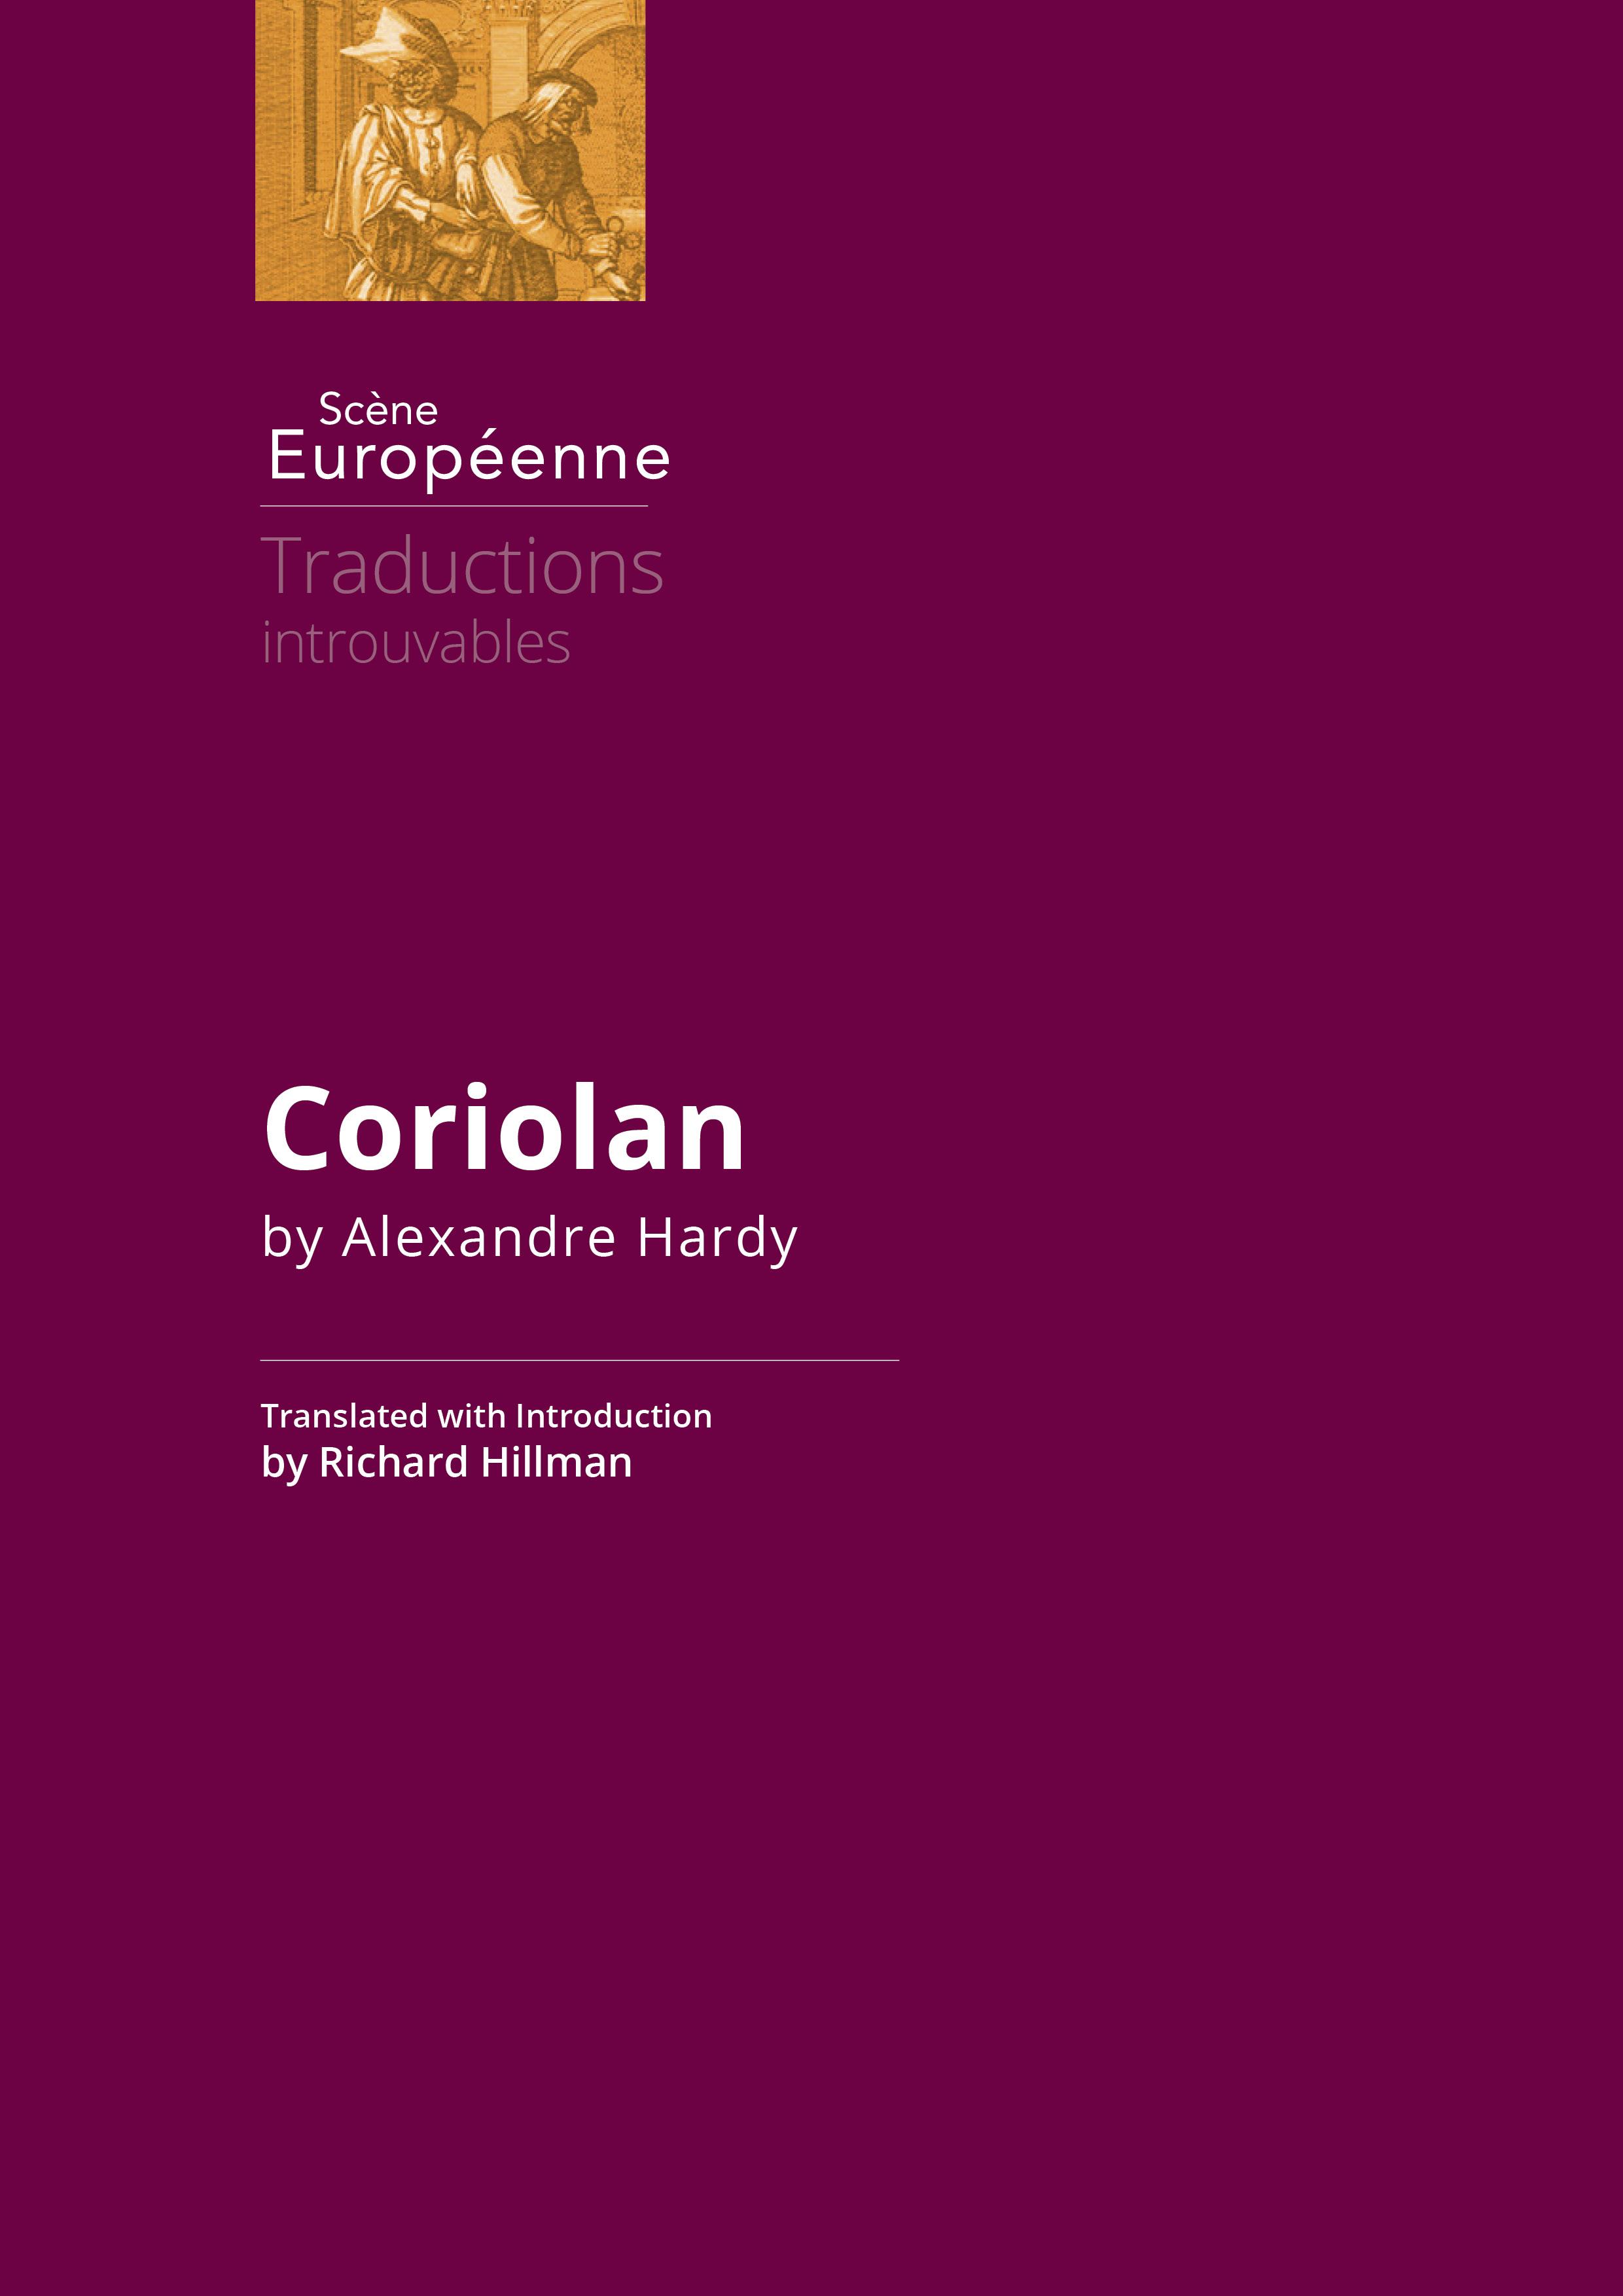 Couverture - Coriolan